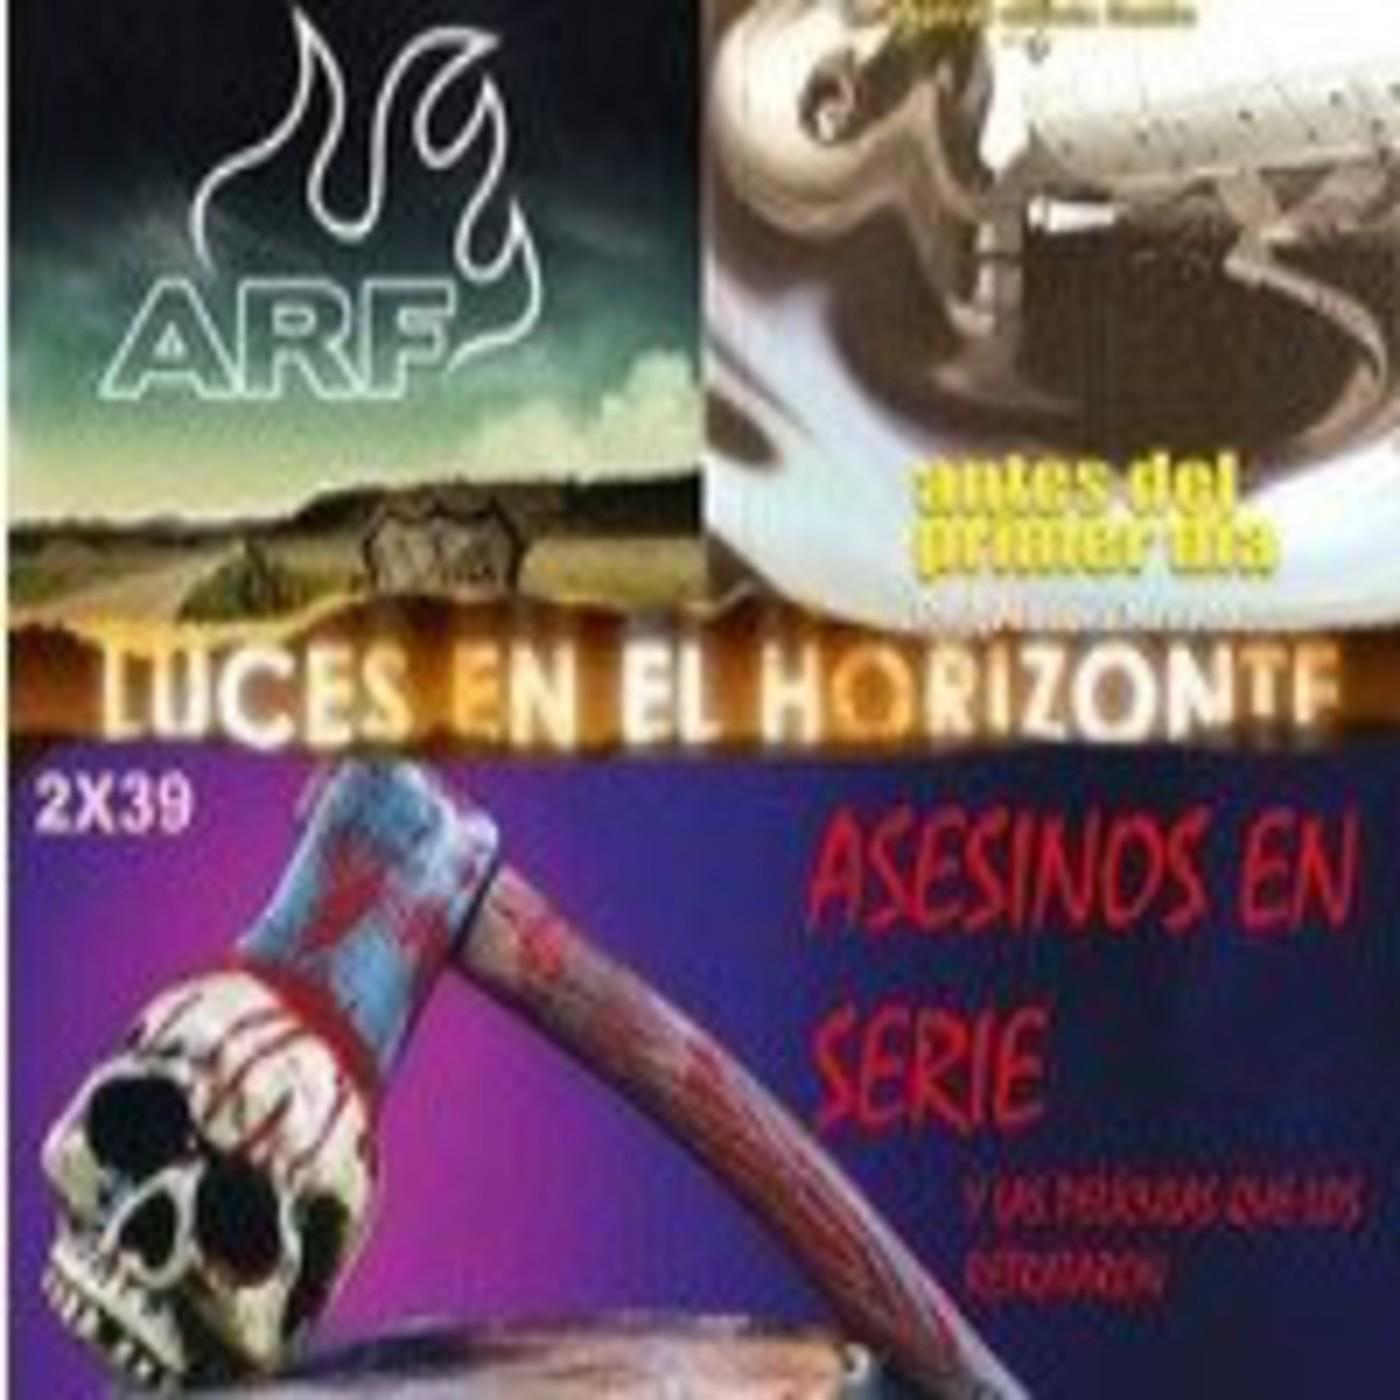 Luces en el Horizonte 2X39: Asesinos en Serie, Azkena Rock Festival, Raúl López Nevado